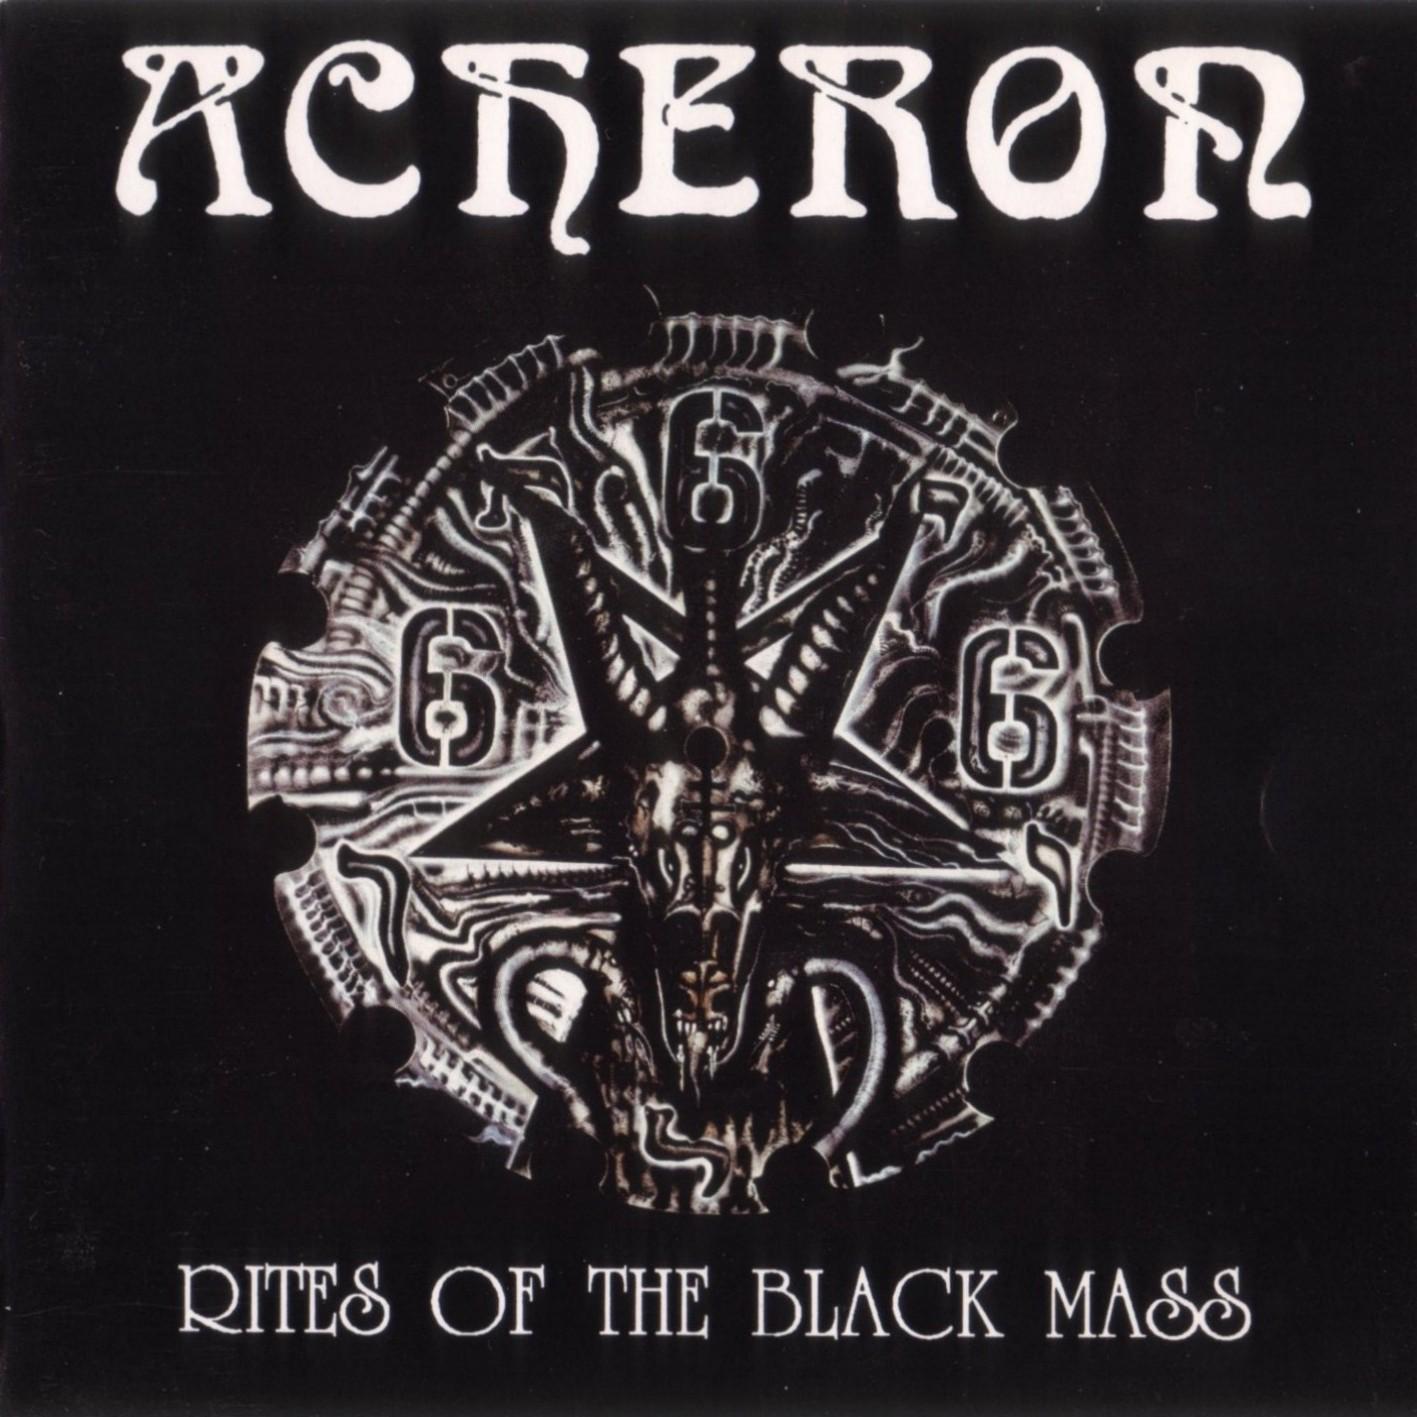 Photo of the black mass